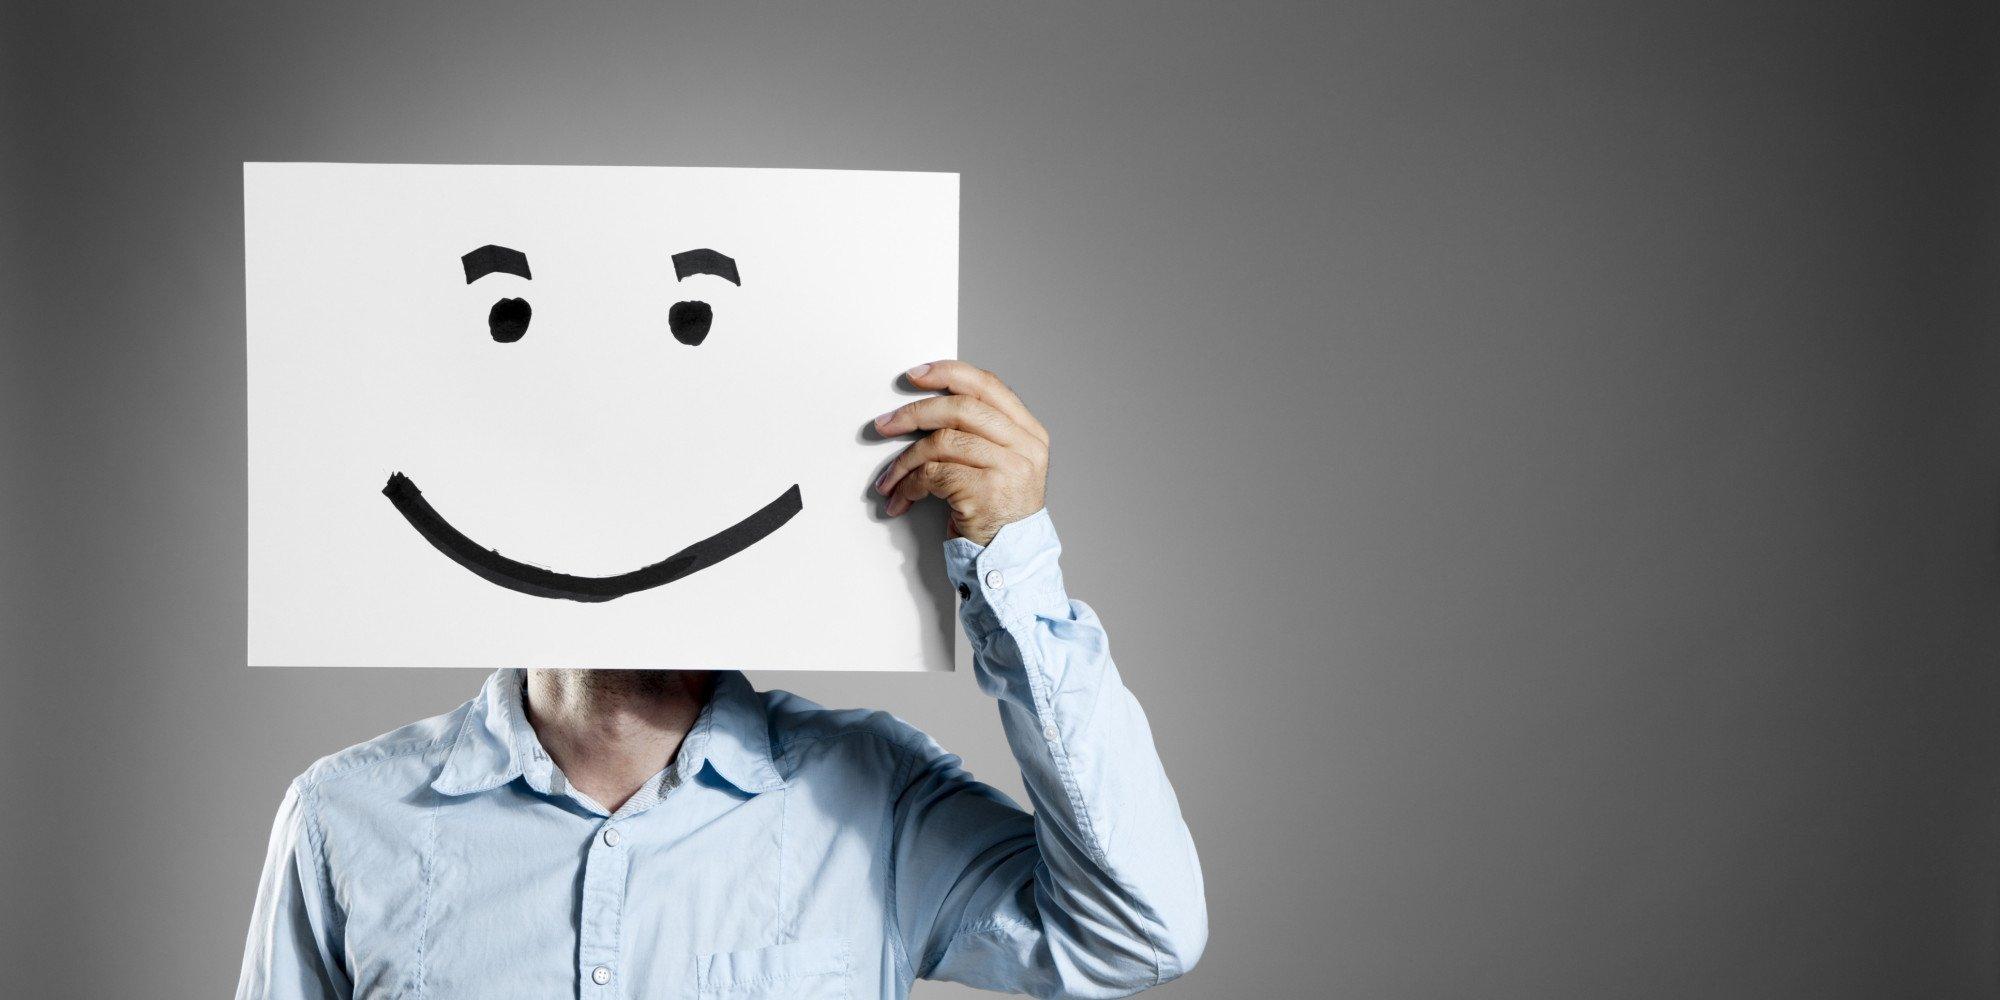 cara sorridente falsa